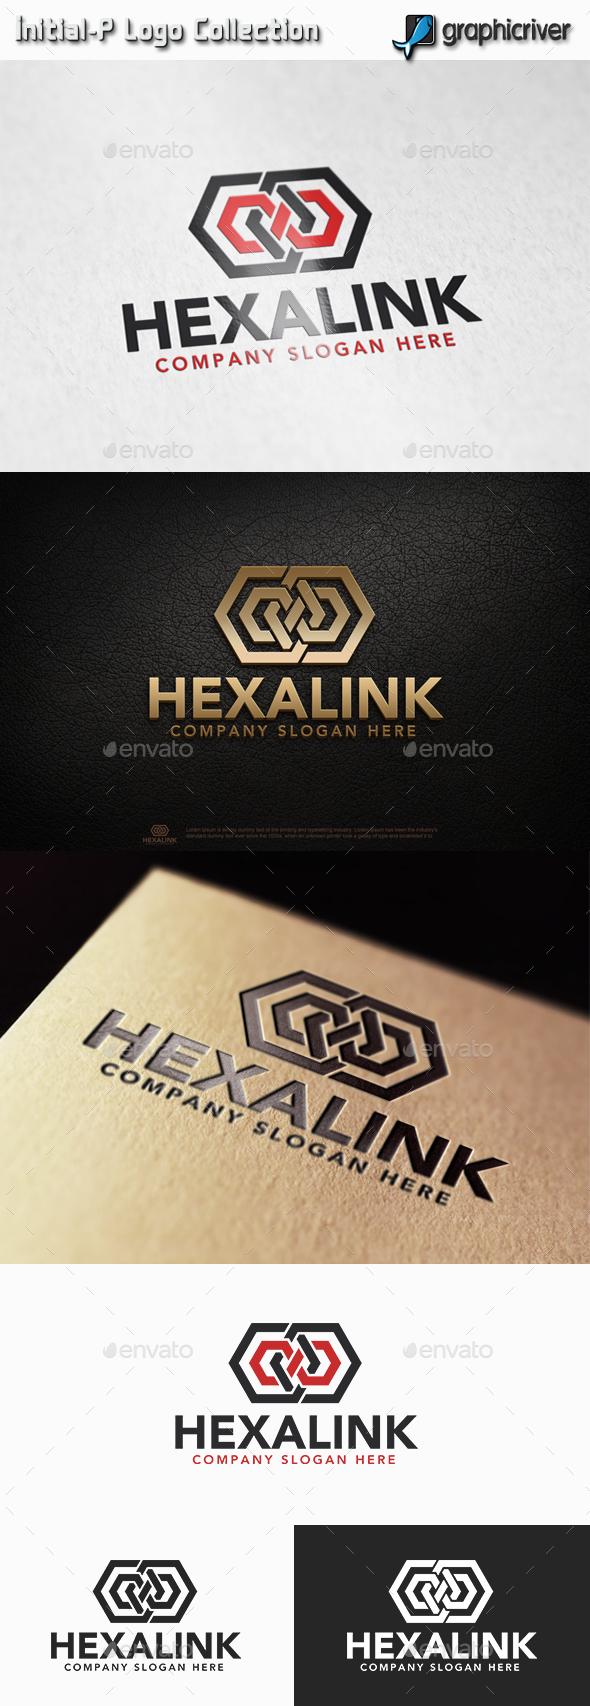 Hexagon Link - Infinity Hexagon Logo